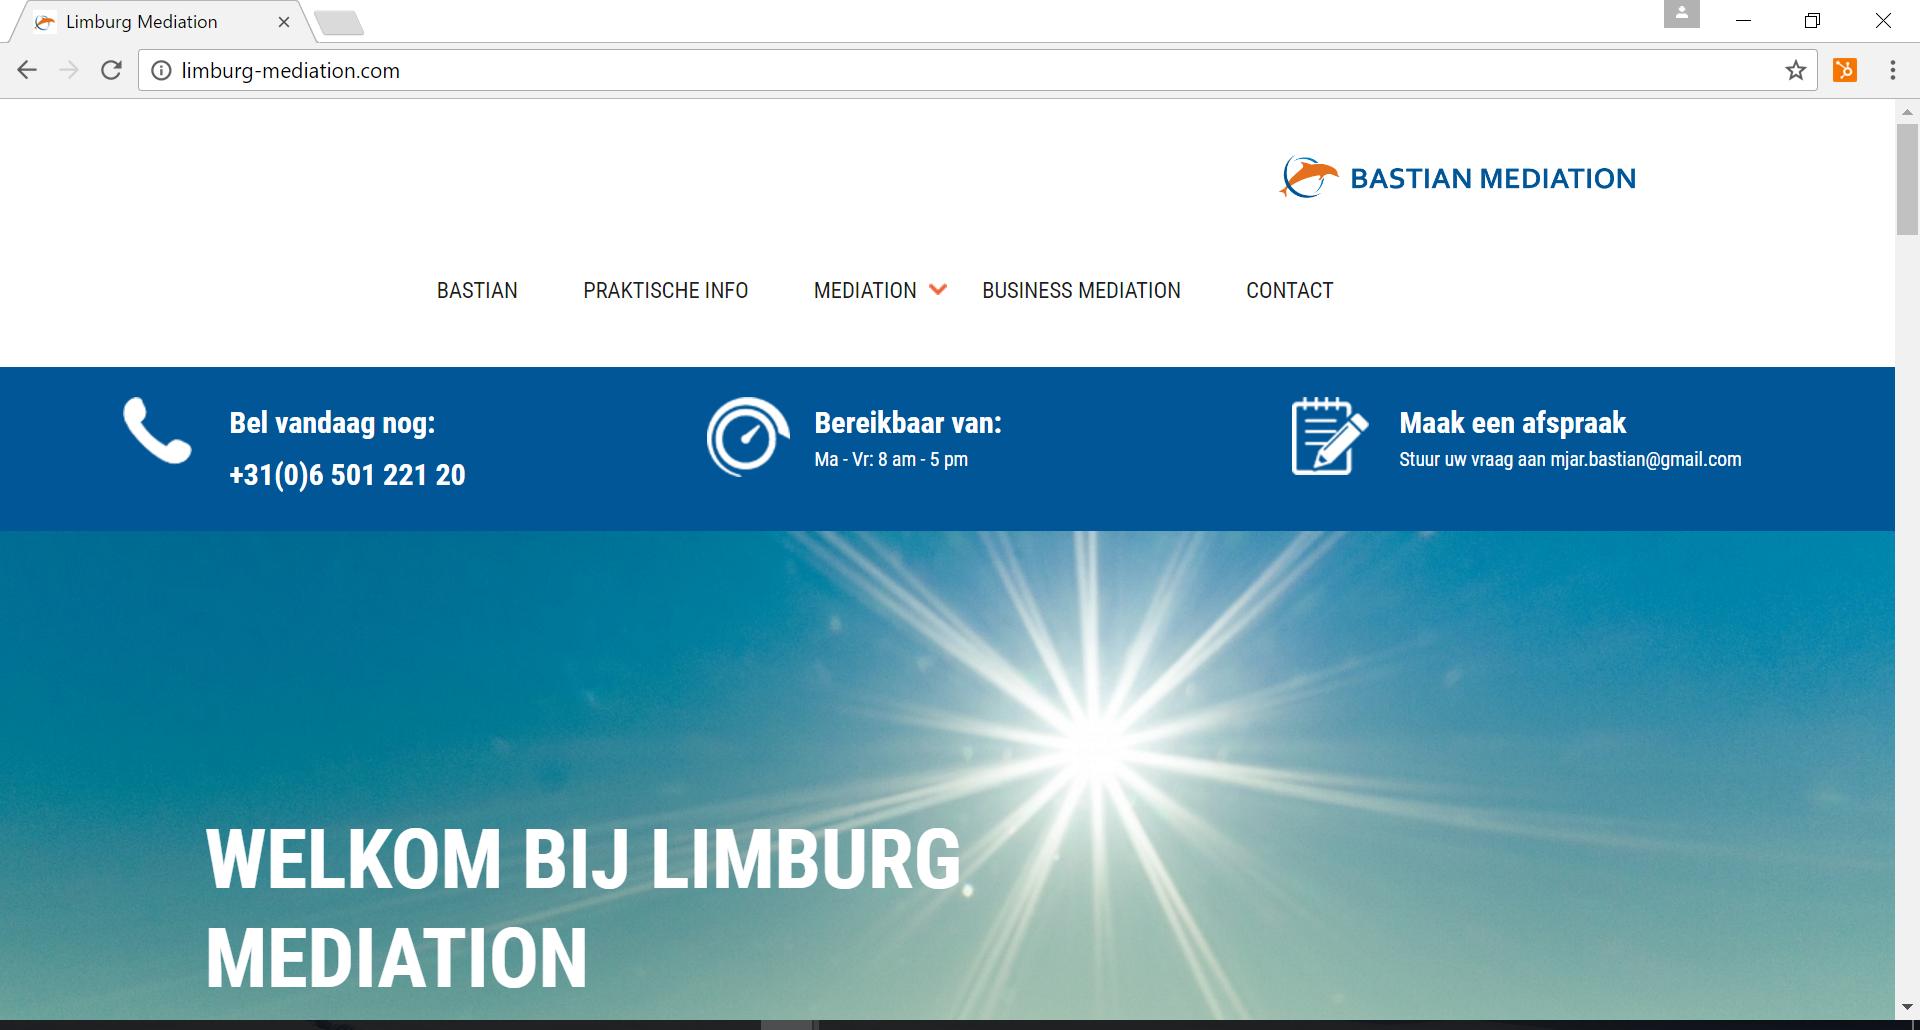 Ronald Bastian Mediation Limburg